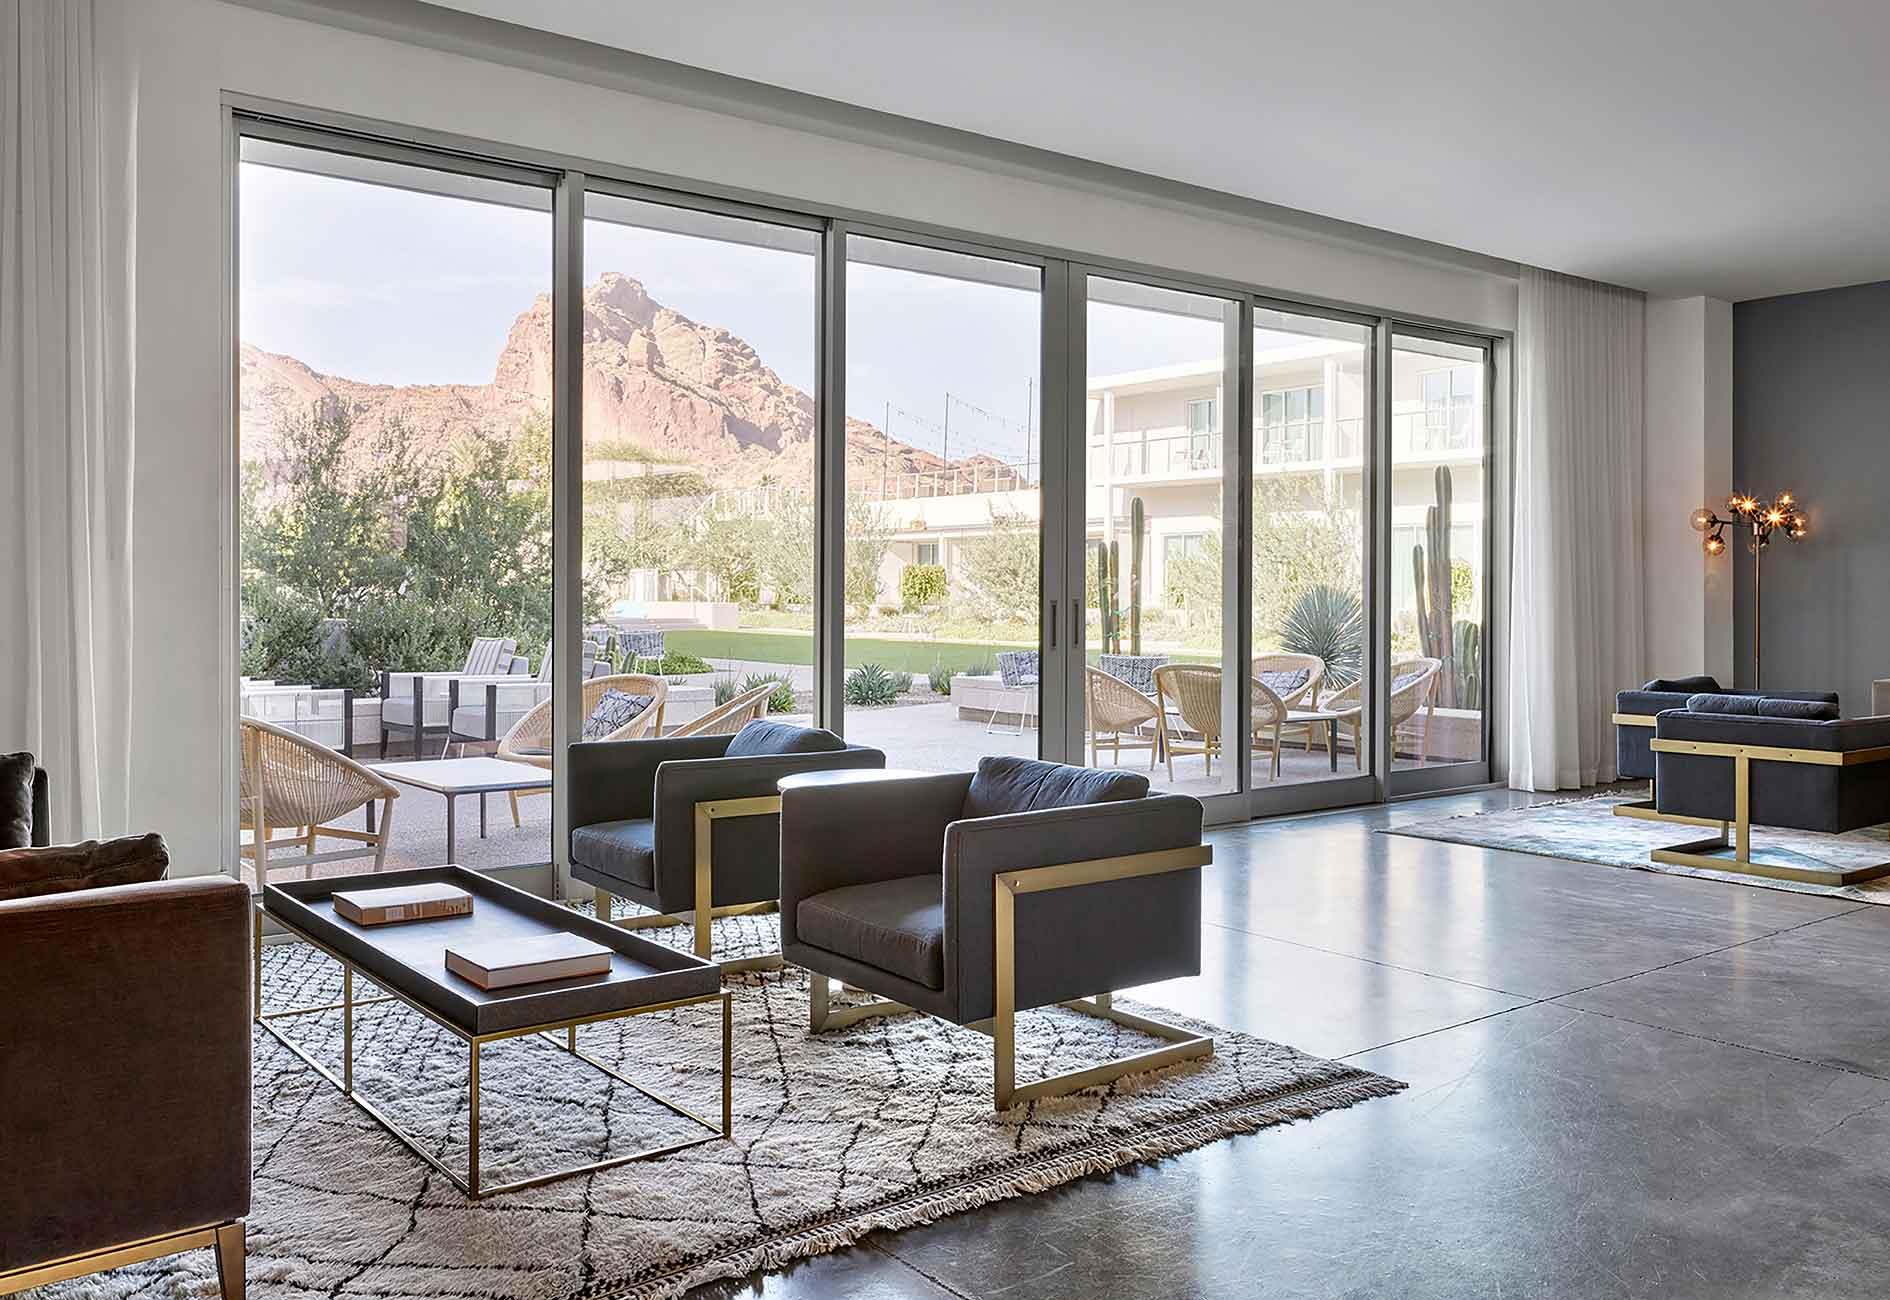 Mountains + Mid-Century Modern: MARKZEFF's Balances Both at the Mountain Shadows Resort in Arizona